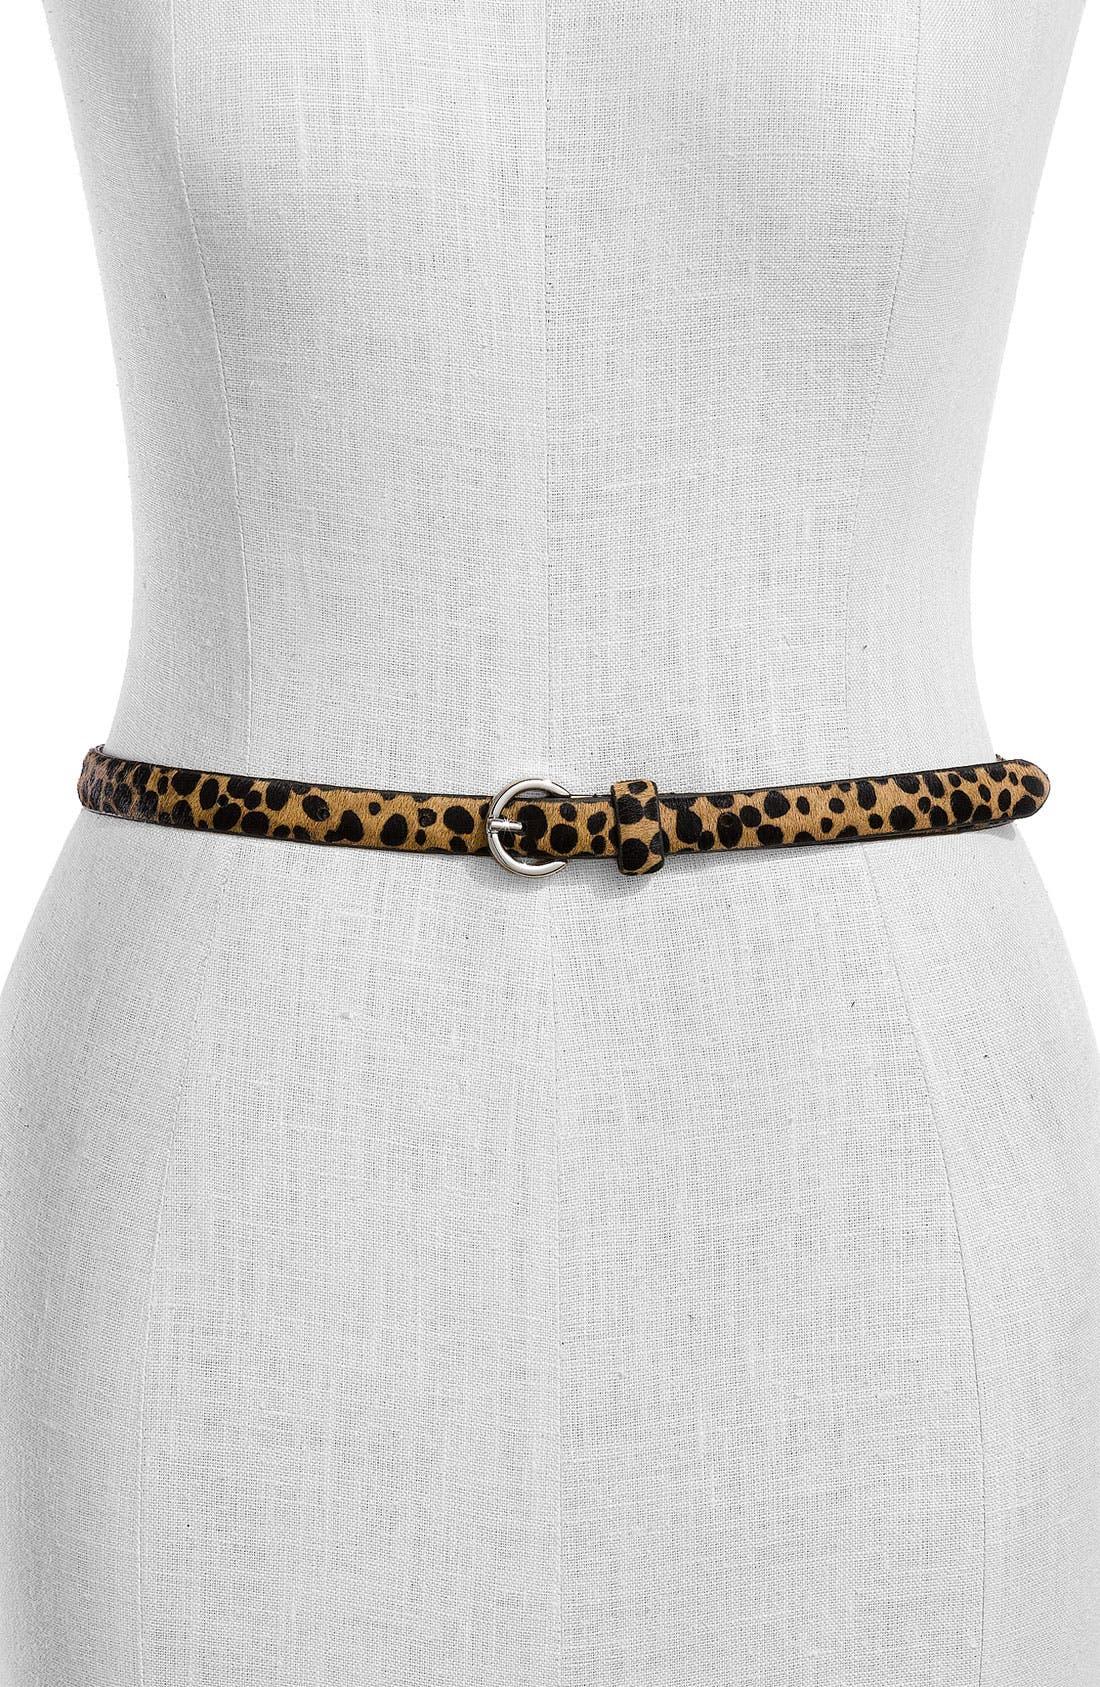 Main Image - Fina Firenze 'Leopard - Skinny' Calf Hair Belt